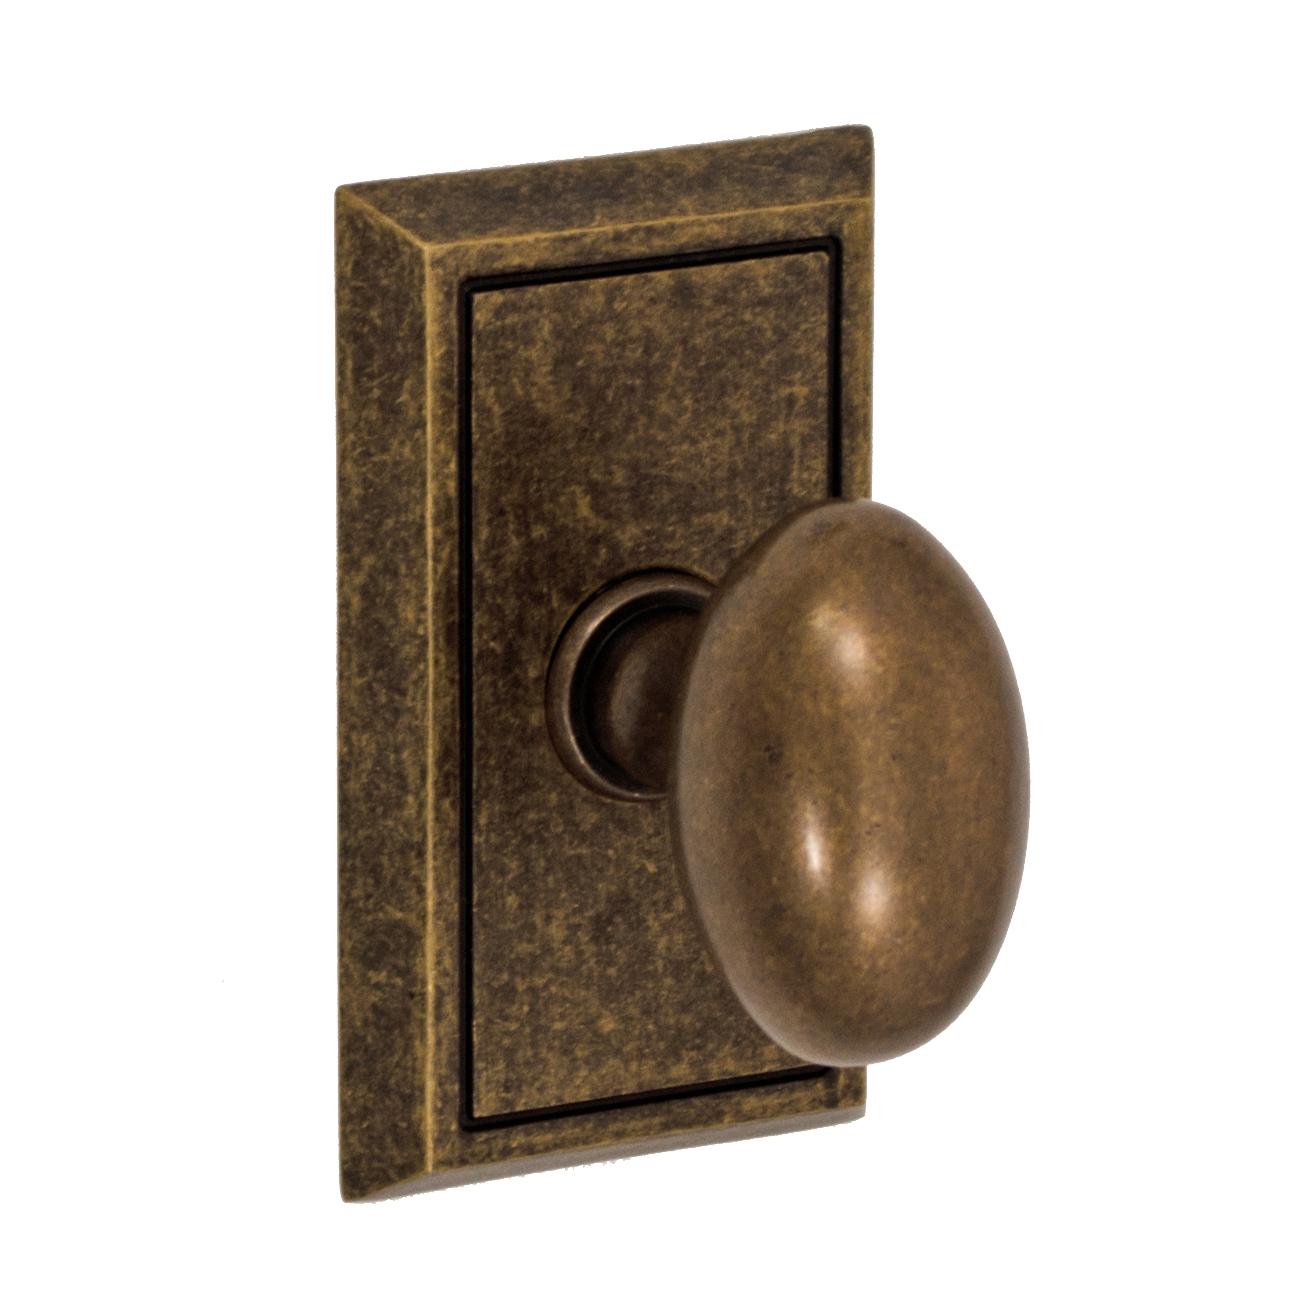 fusion door knobs photo - 6